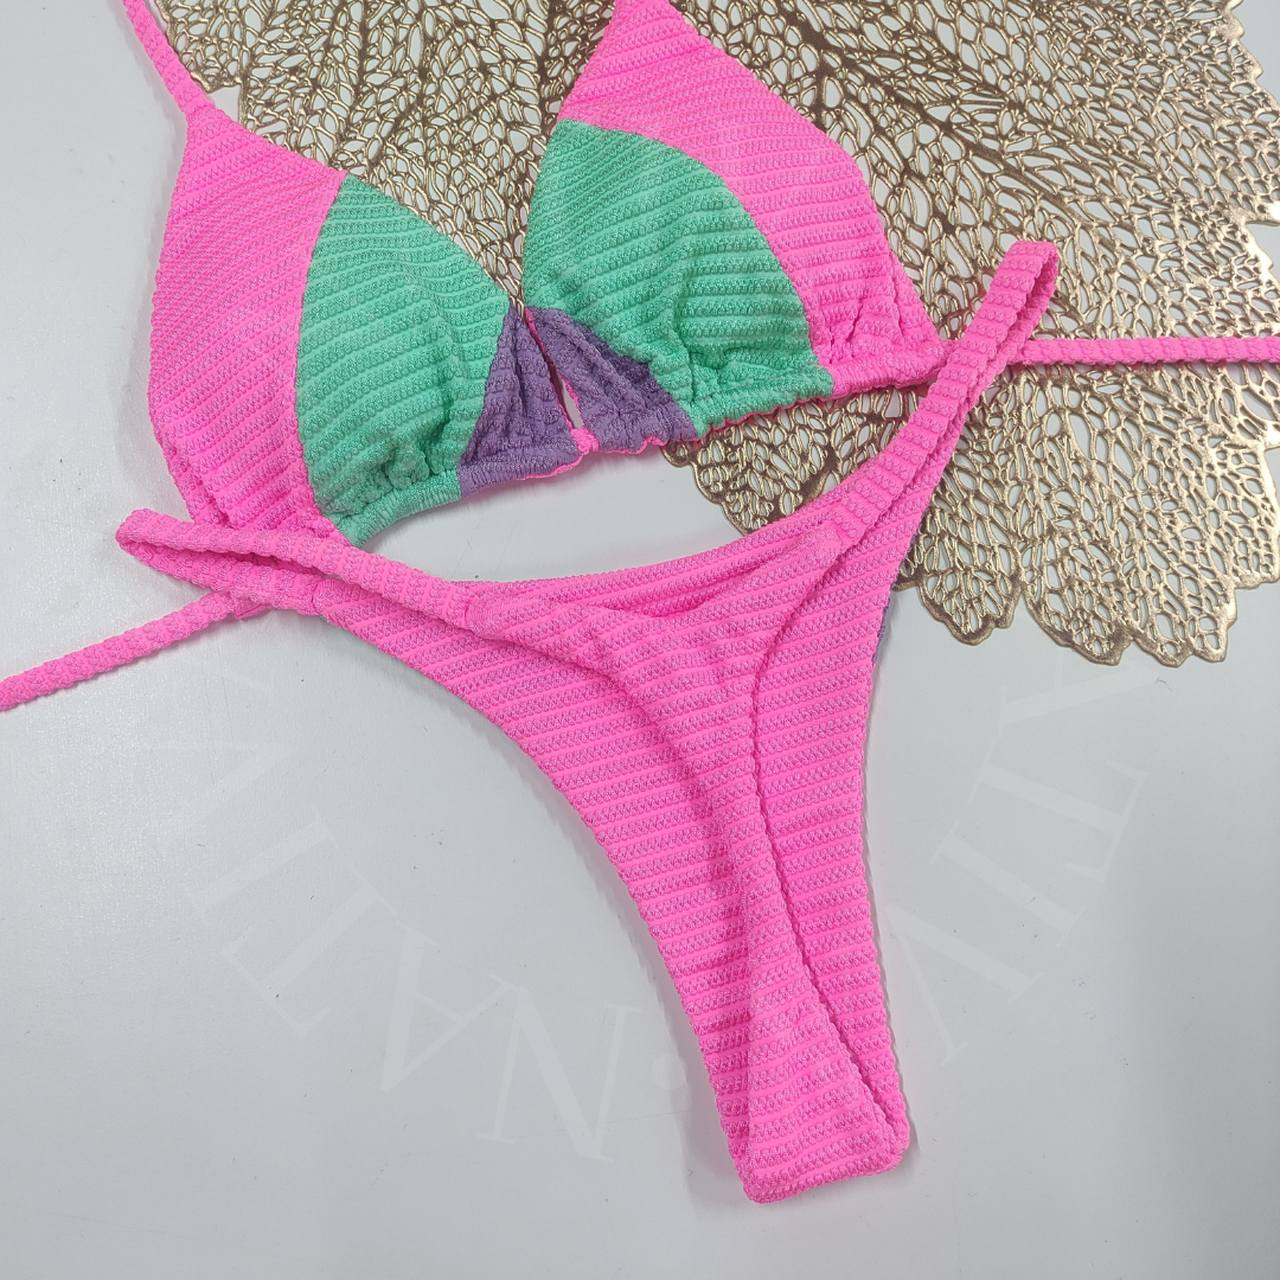 Conjunto com bojo 014 - Rosa/Verde Água/Lavanda